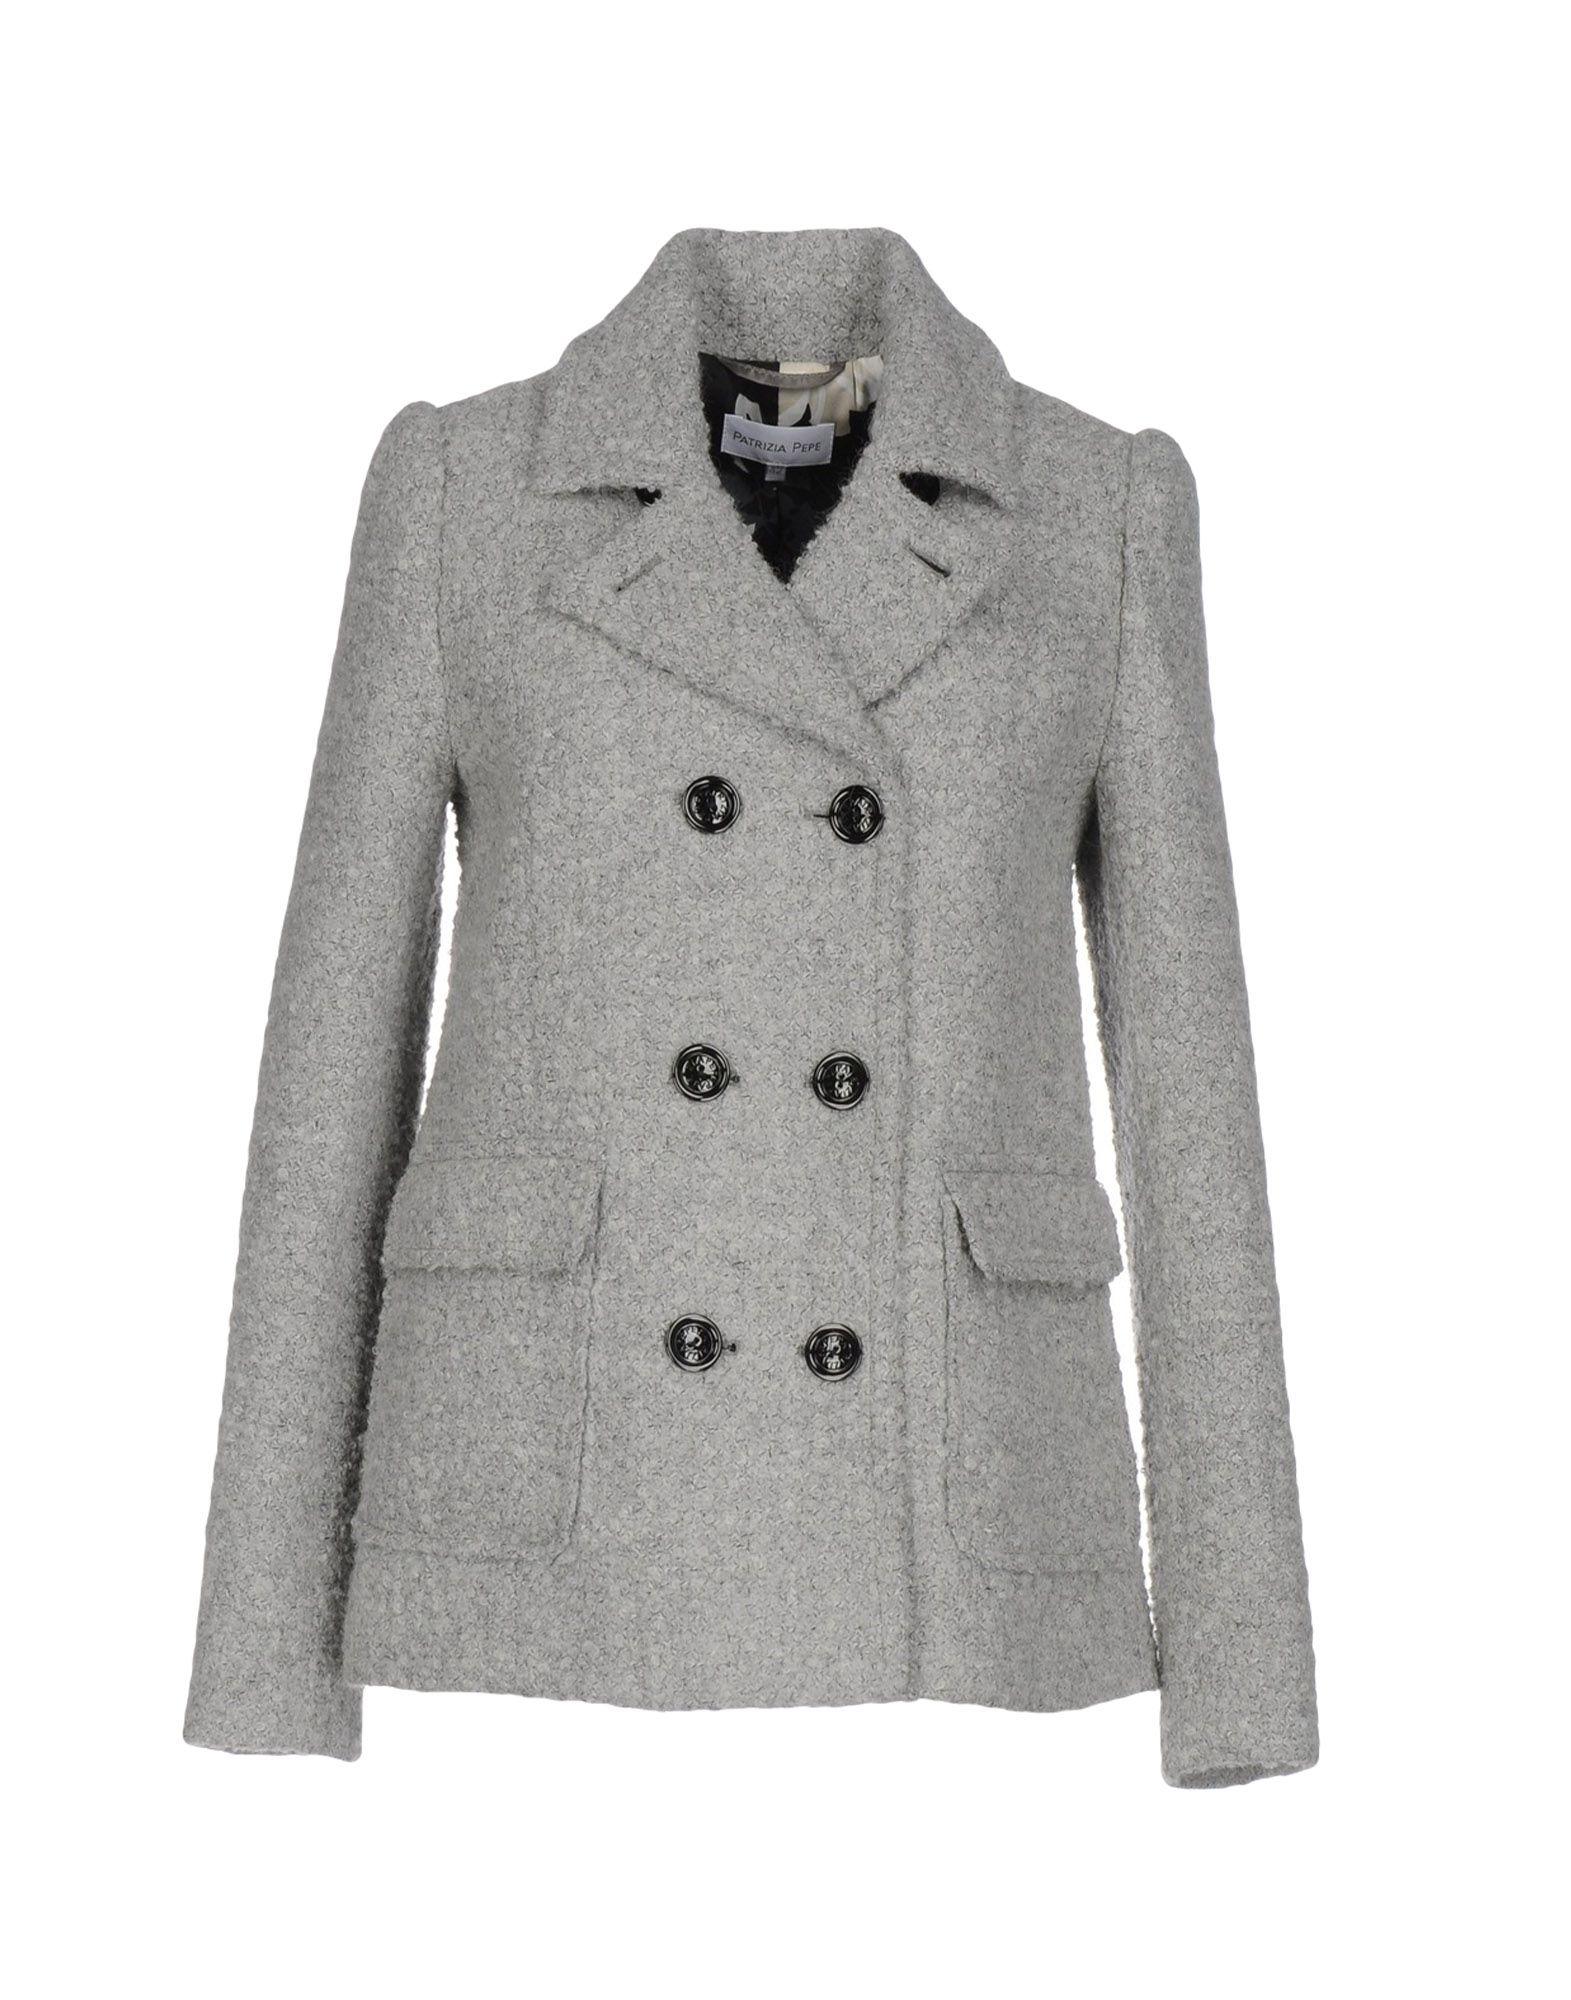 5503d25b2d Patrizia Pepe Coats In Grey